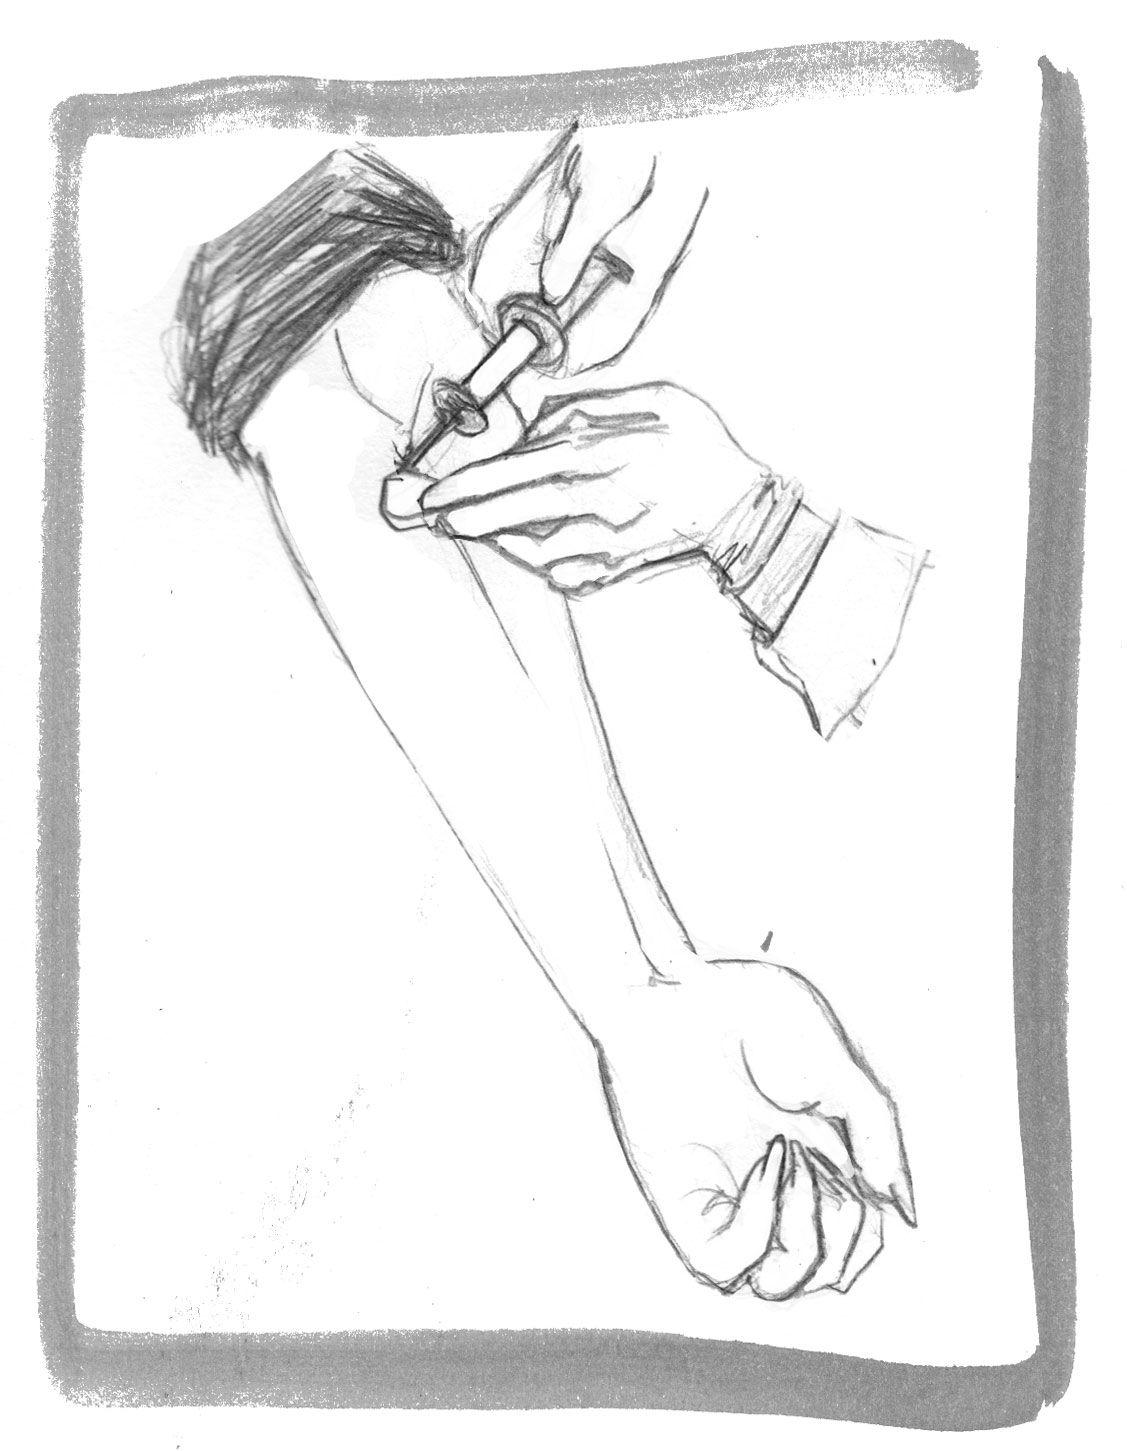 Step 2, illustrated